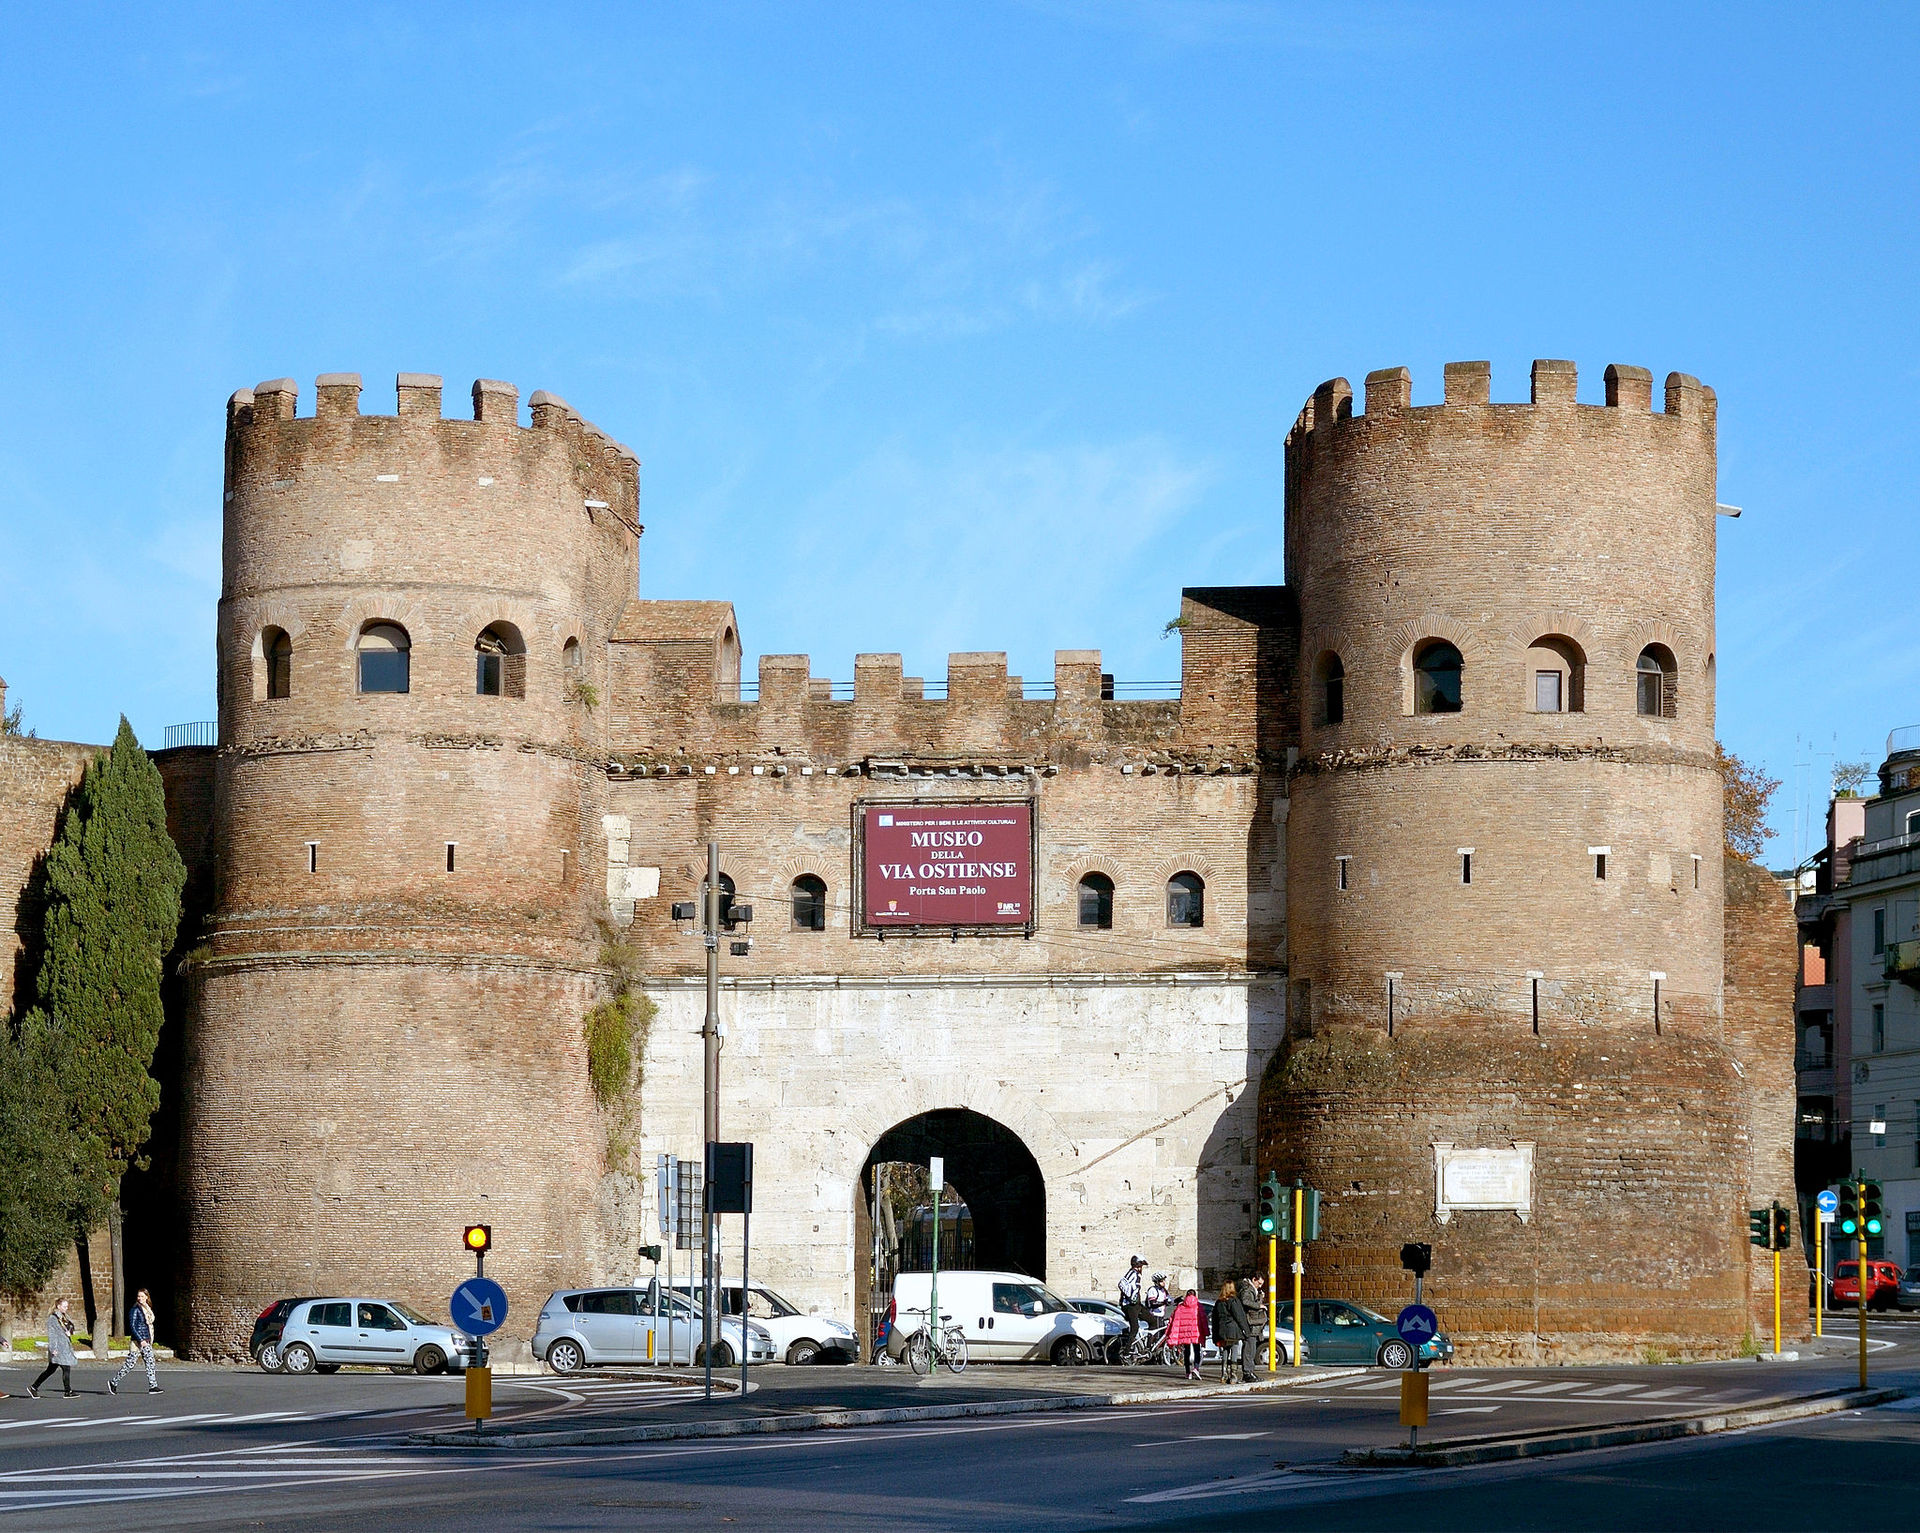 Porta san paolo wikipedia - Porte a roma ...